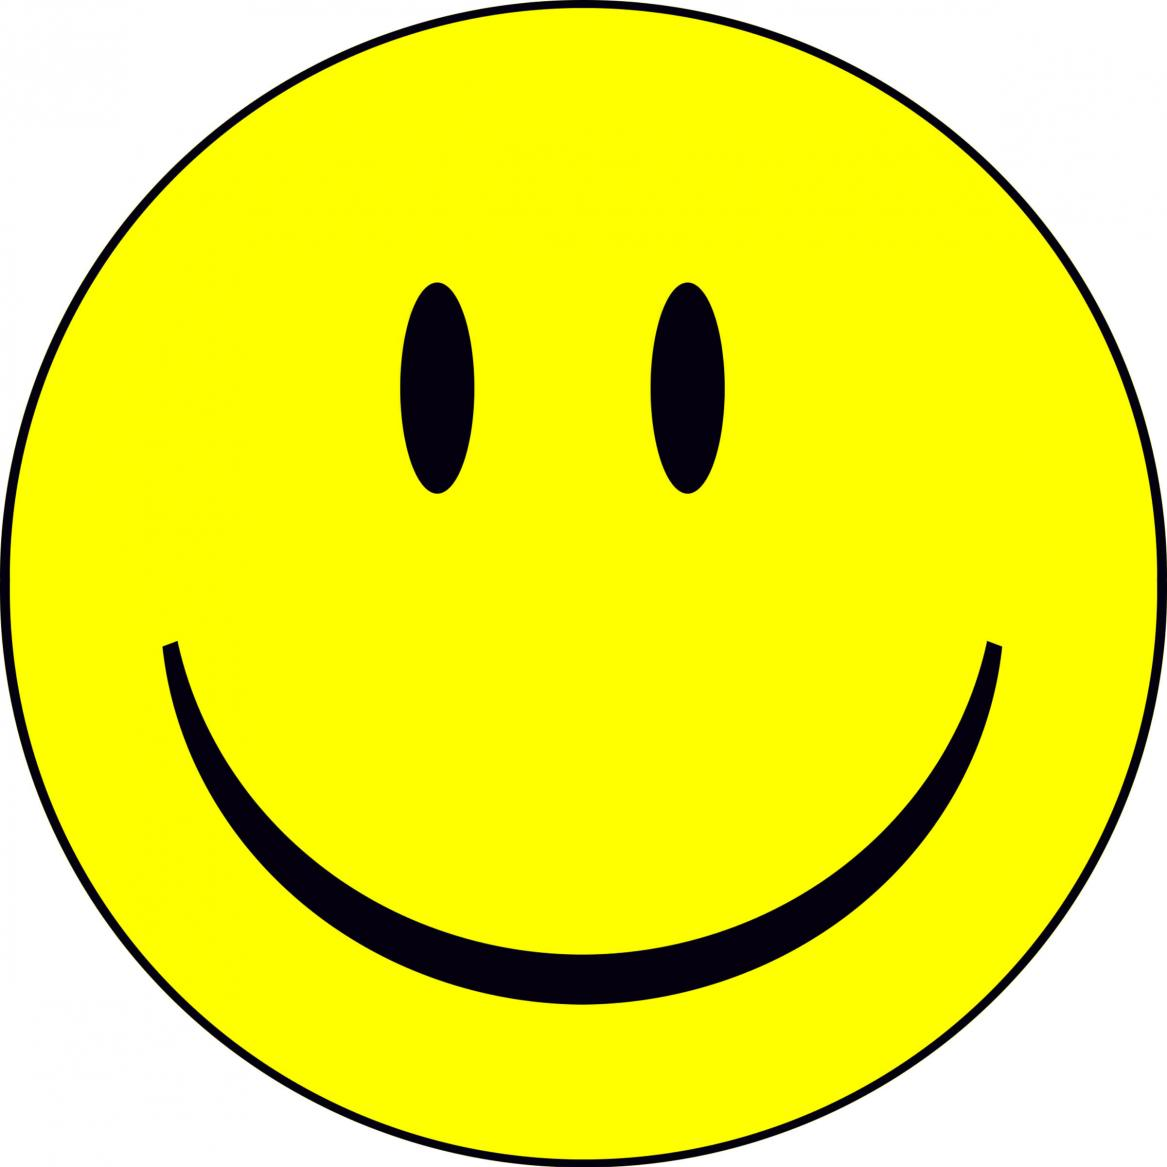 Smiley Face Clip Art Emotions-smiley face clip art emotions-8